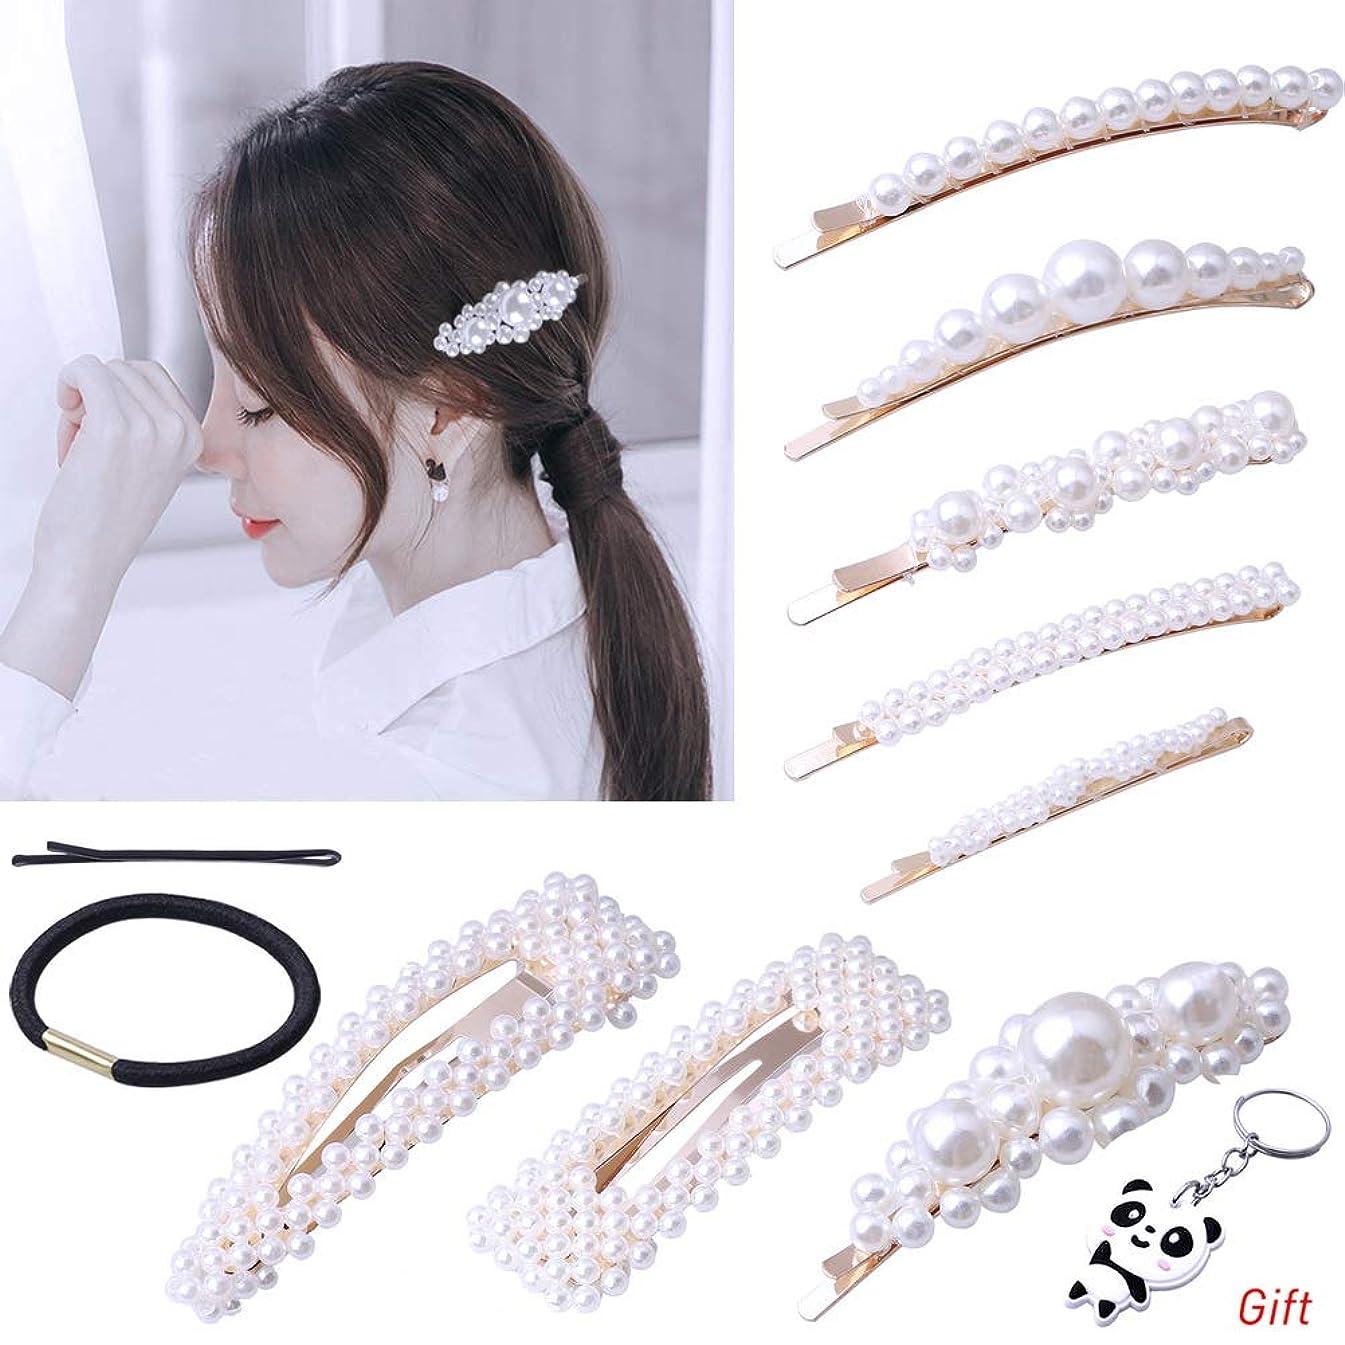 8 Pcs Pearls Hair Clips, Color Scissor Pearls Hair Barrettes for Girls Women Wedding Bridal Artificial Pearl Hairpins Hair Accessories